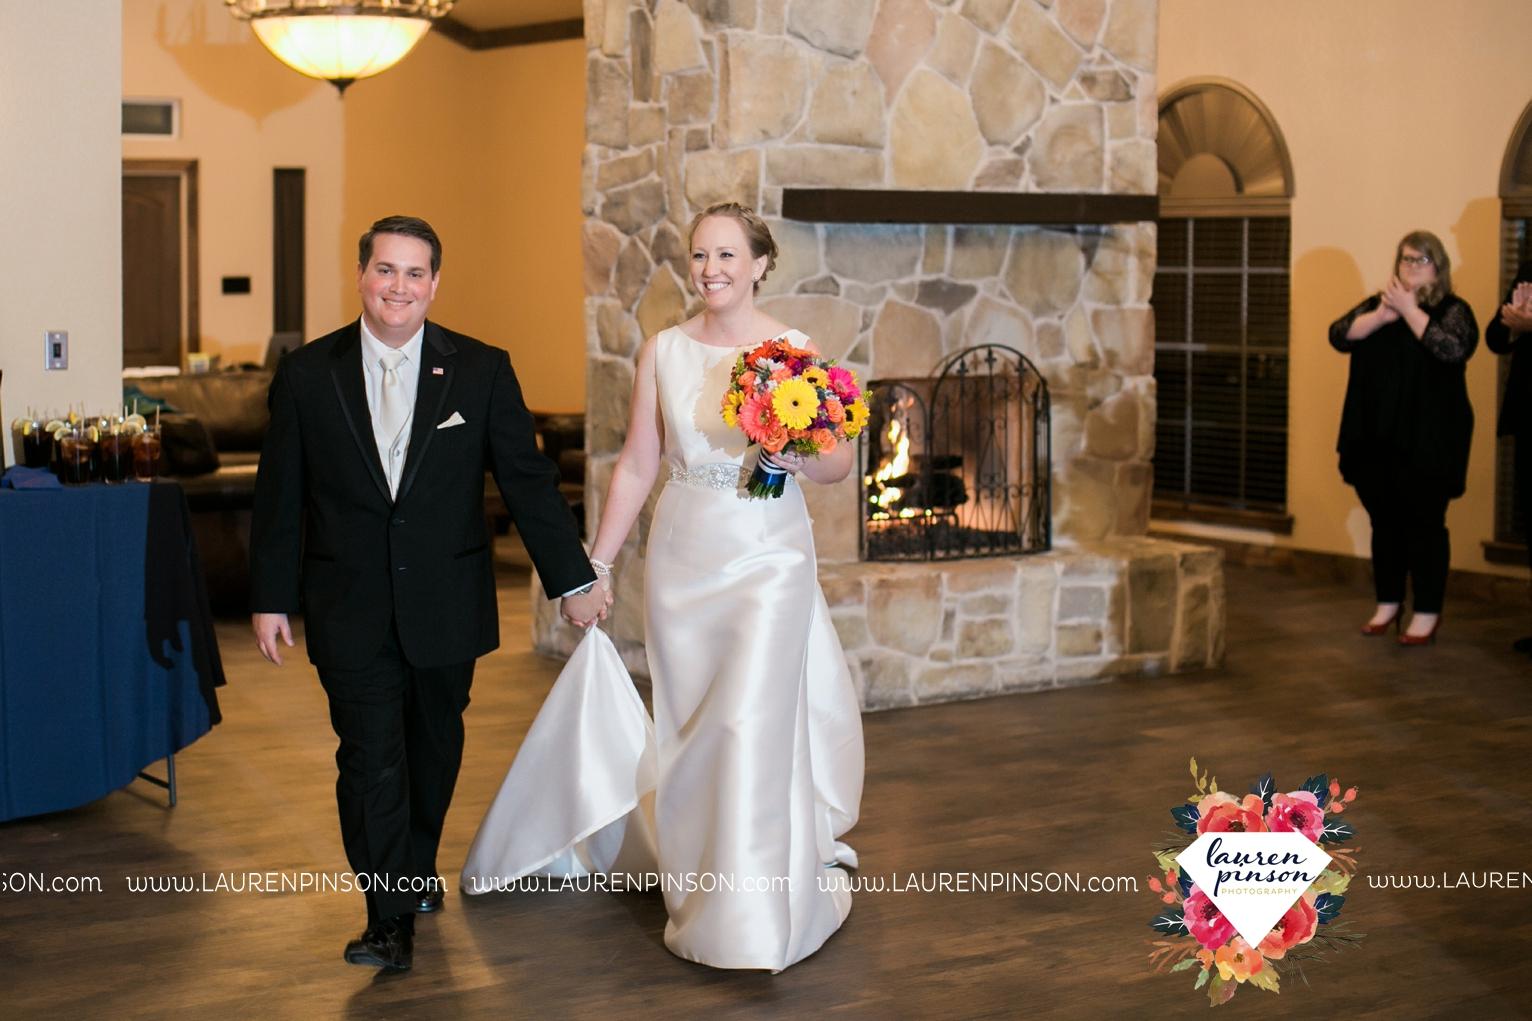 bells-texas-wedding-photography-at-willowood-ranch-chapel-north-texas-wichita-falls-wedding-photographer_1893.jpg